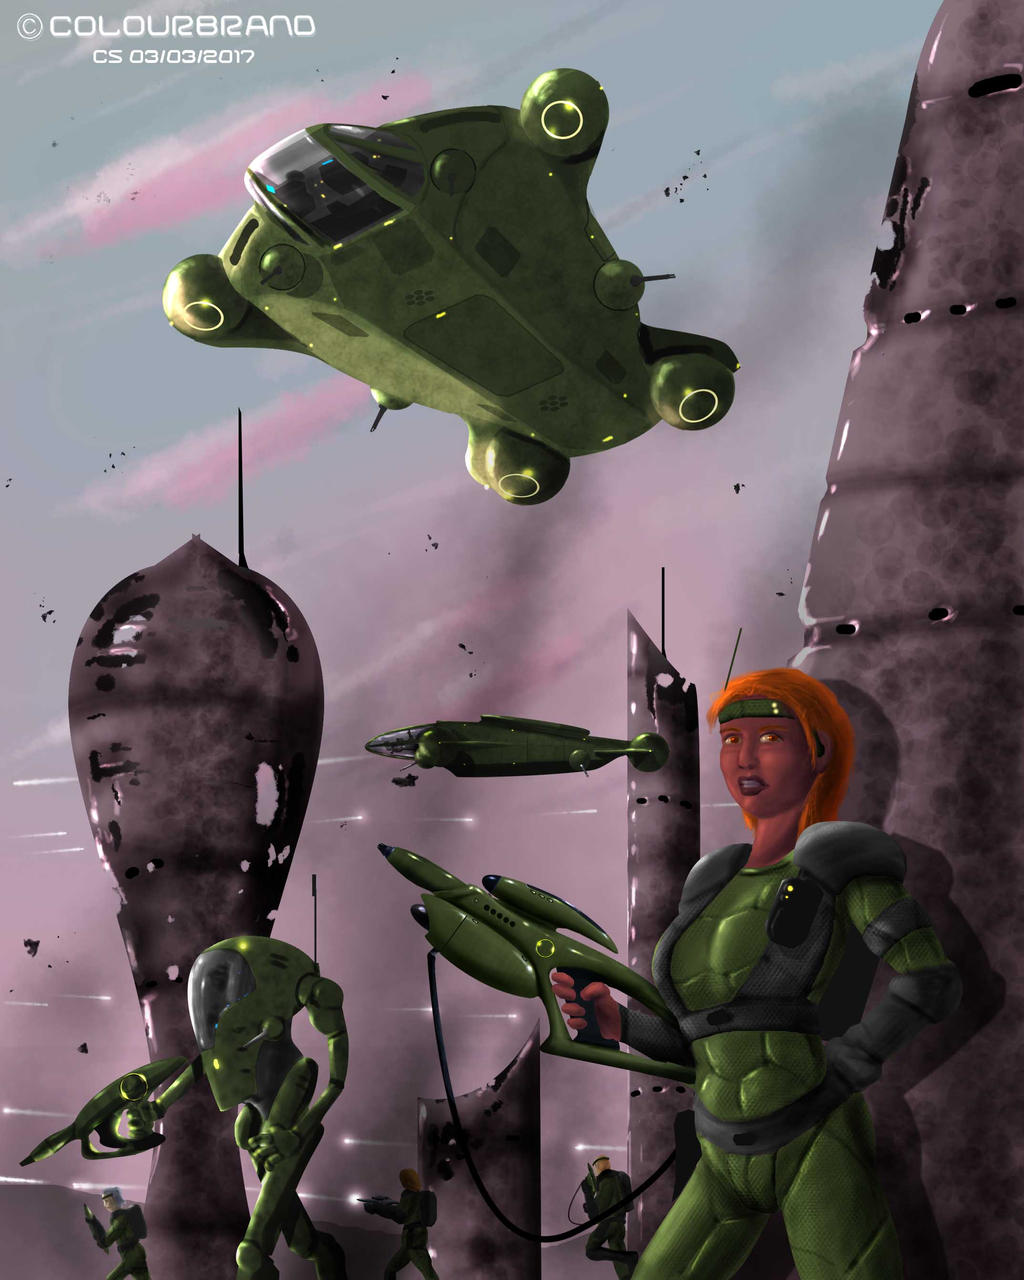 Battlefield by Colourbrand